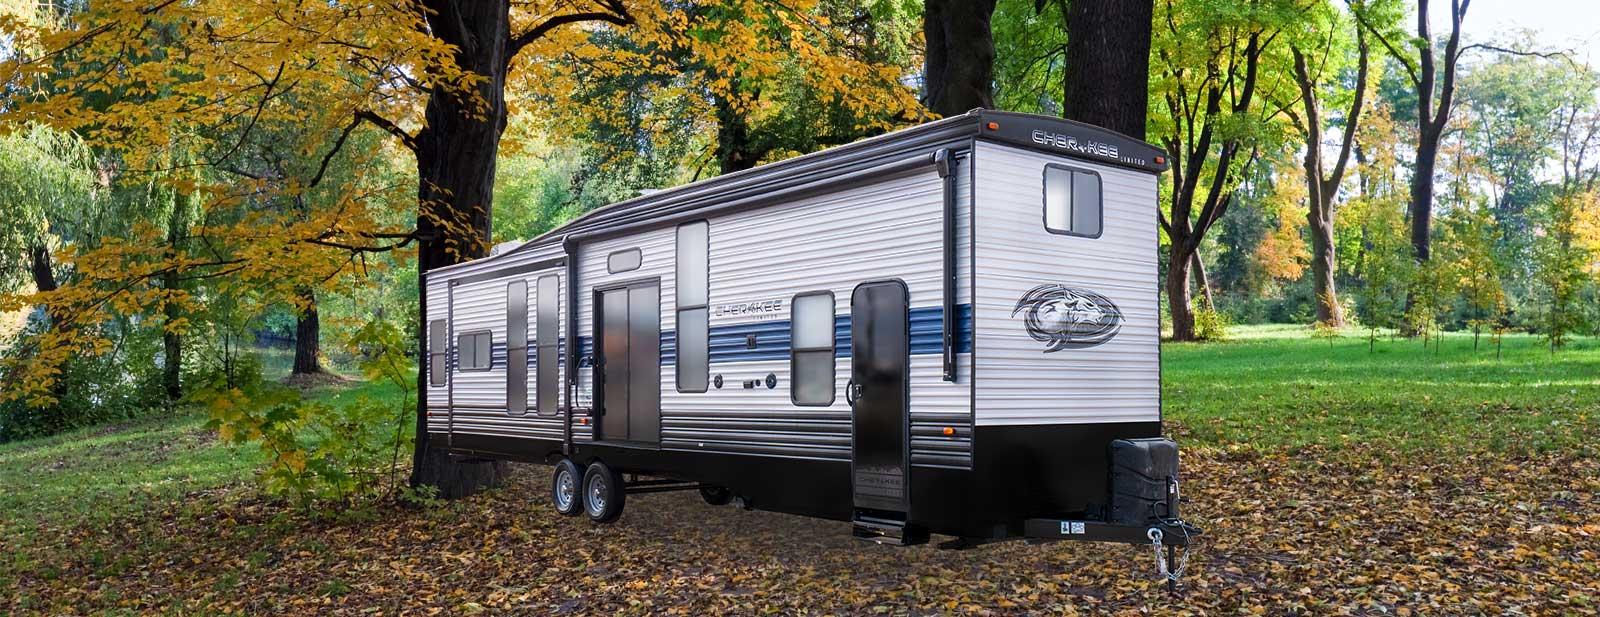 Cherokee Destination | Forest River RV - Manufacturer of